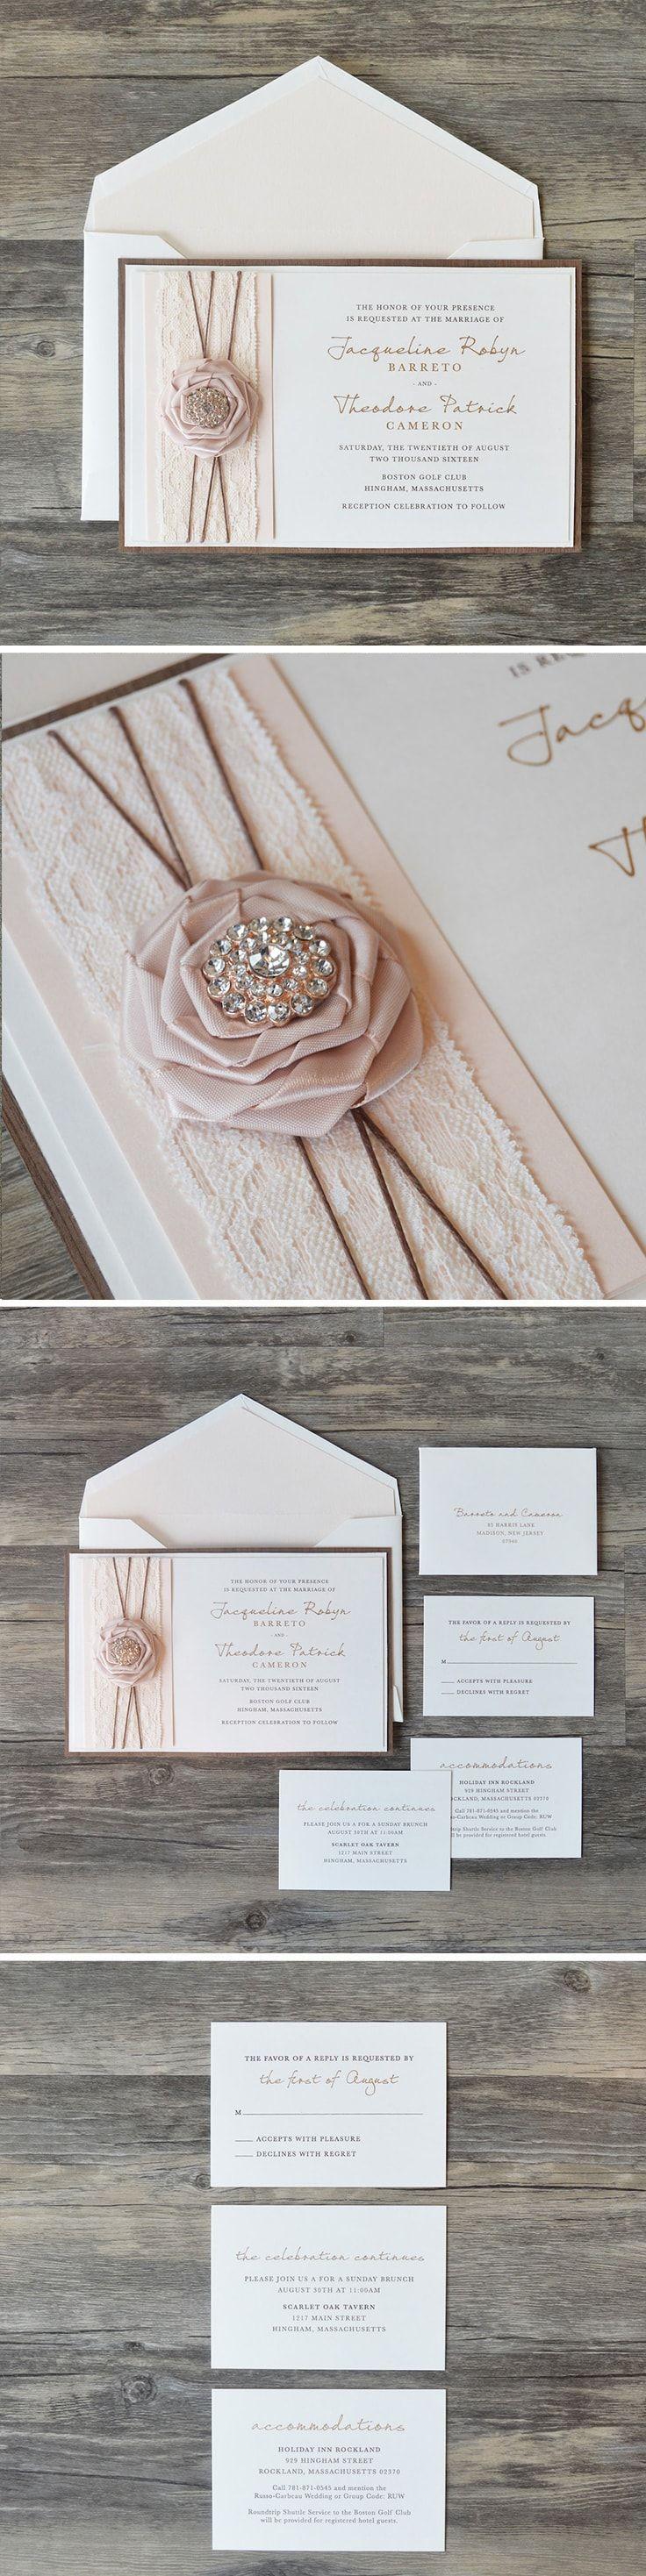 295 best wedding invitations images on Pinterest | Invitations ...